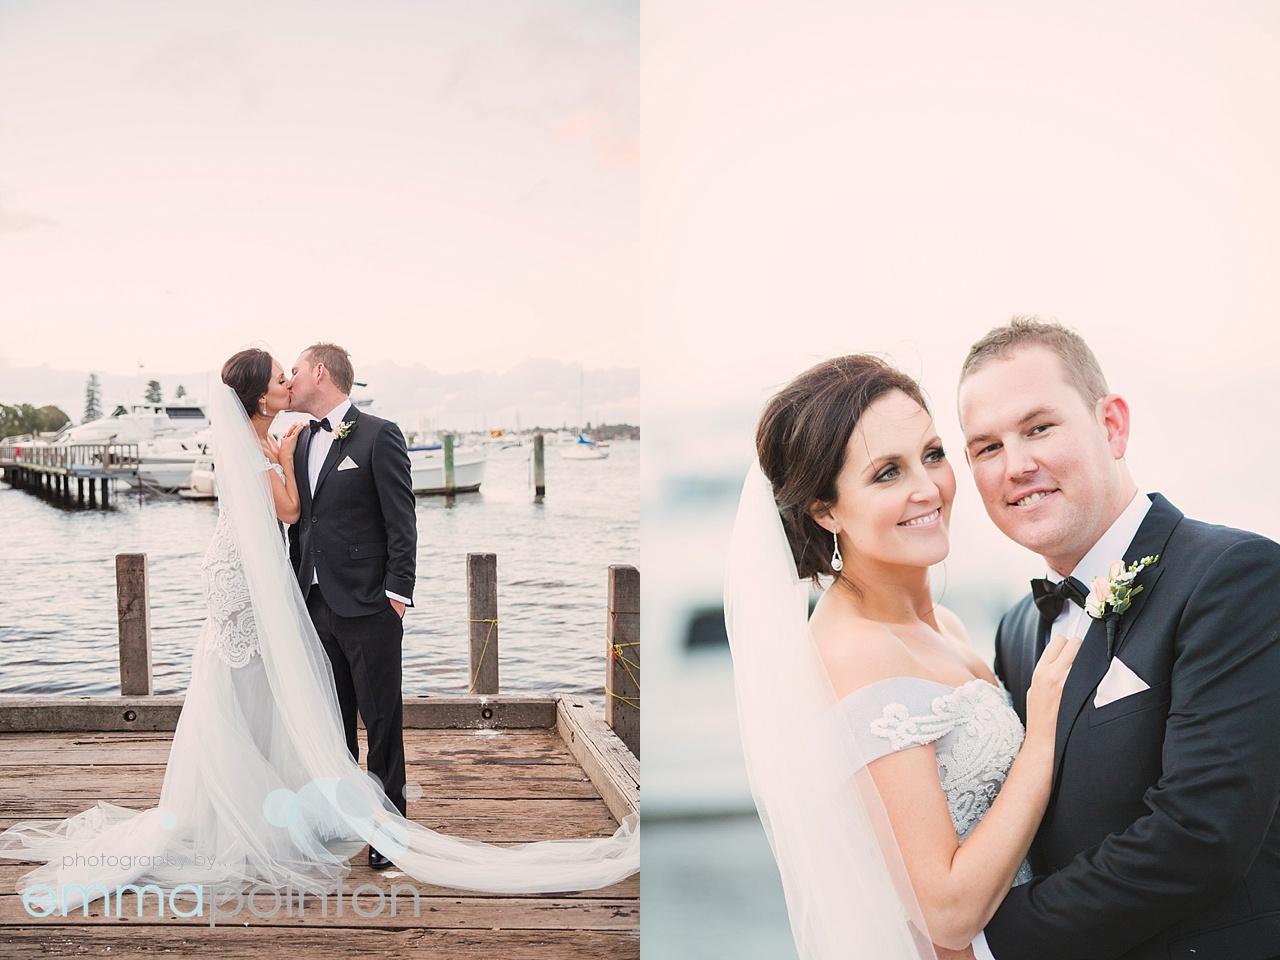 Perth Wedding Photography 073.jpg